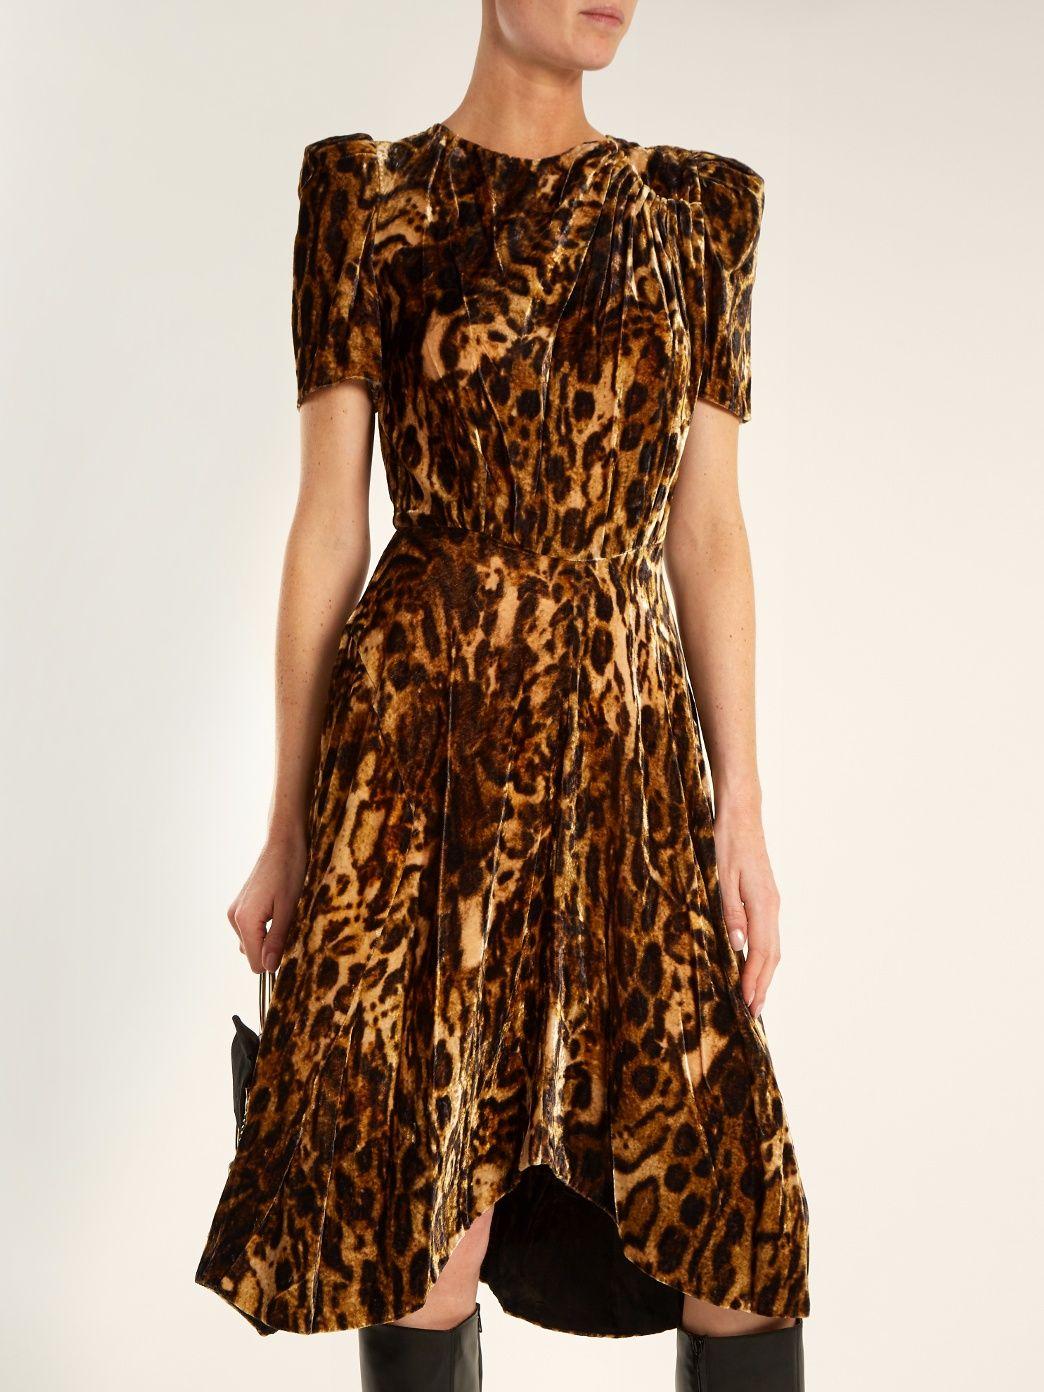 44e211d8e393 Click here to buy Isabel Marant Ulia leopard-print velvet dress at  MATCHESFASHION.COM